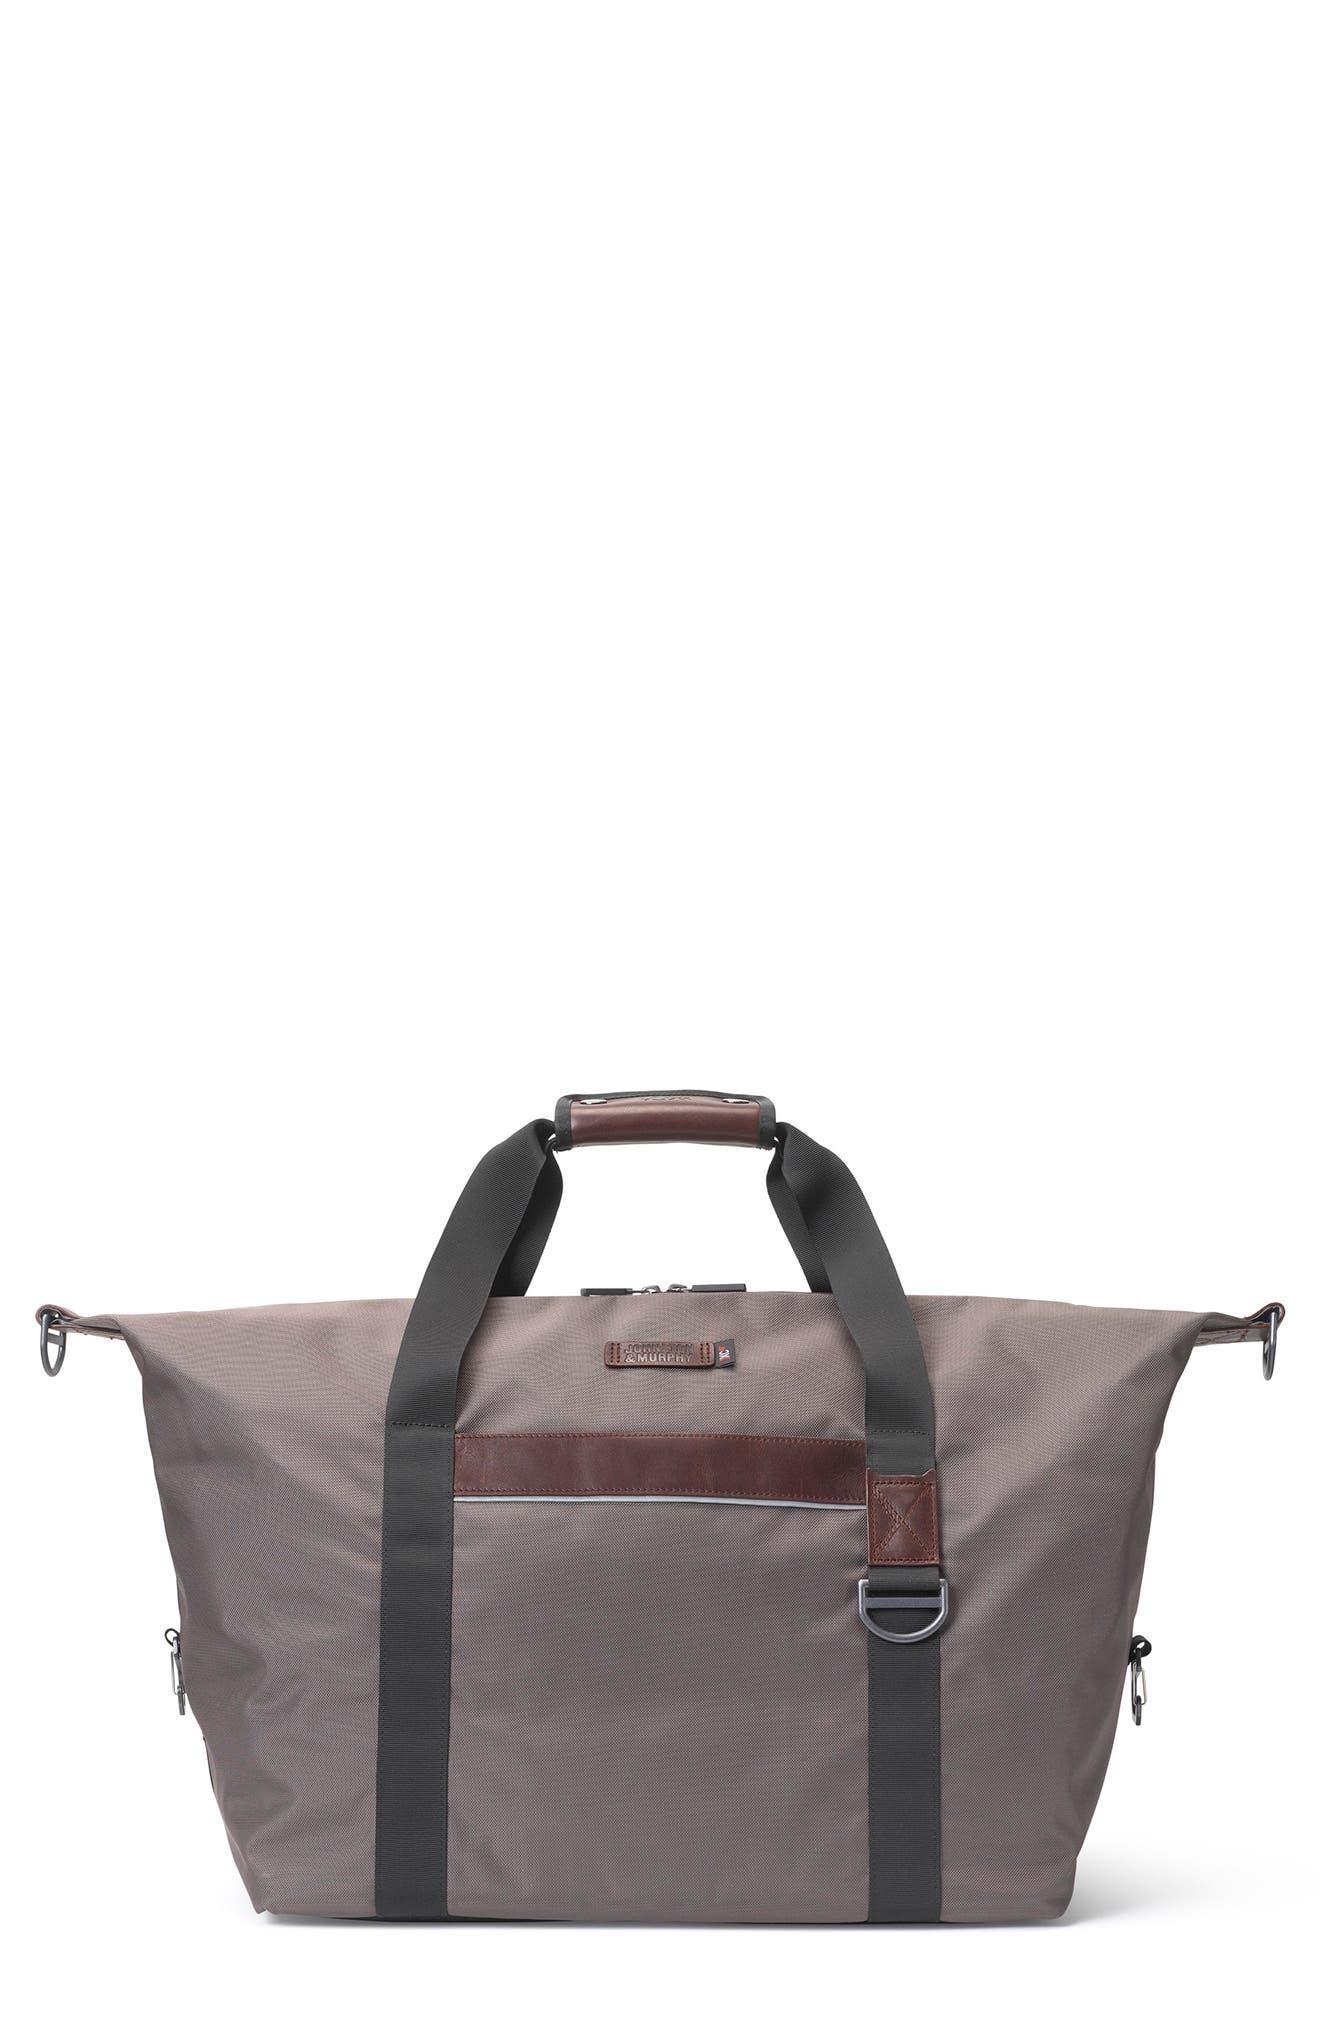 Xc4 Duffle Bag